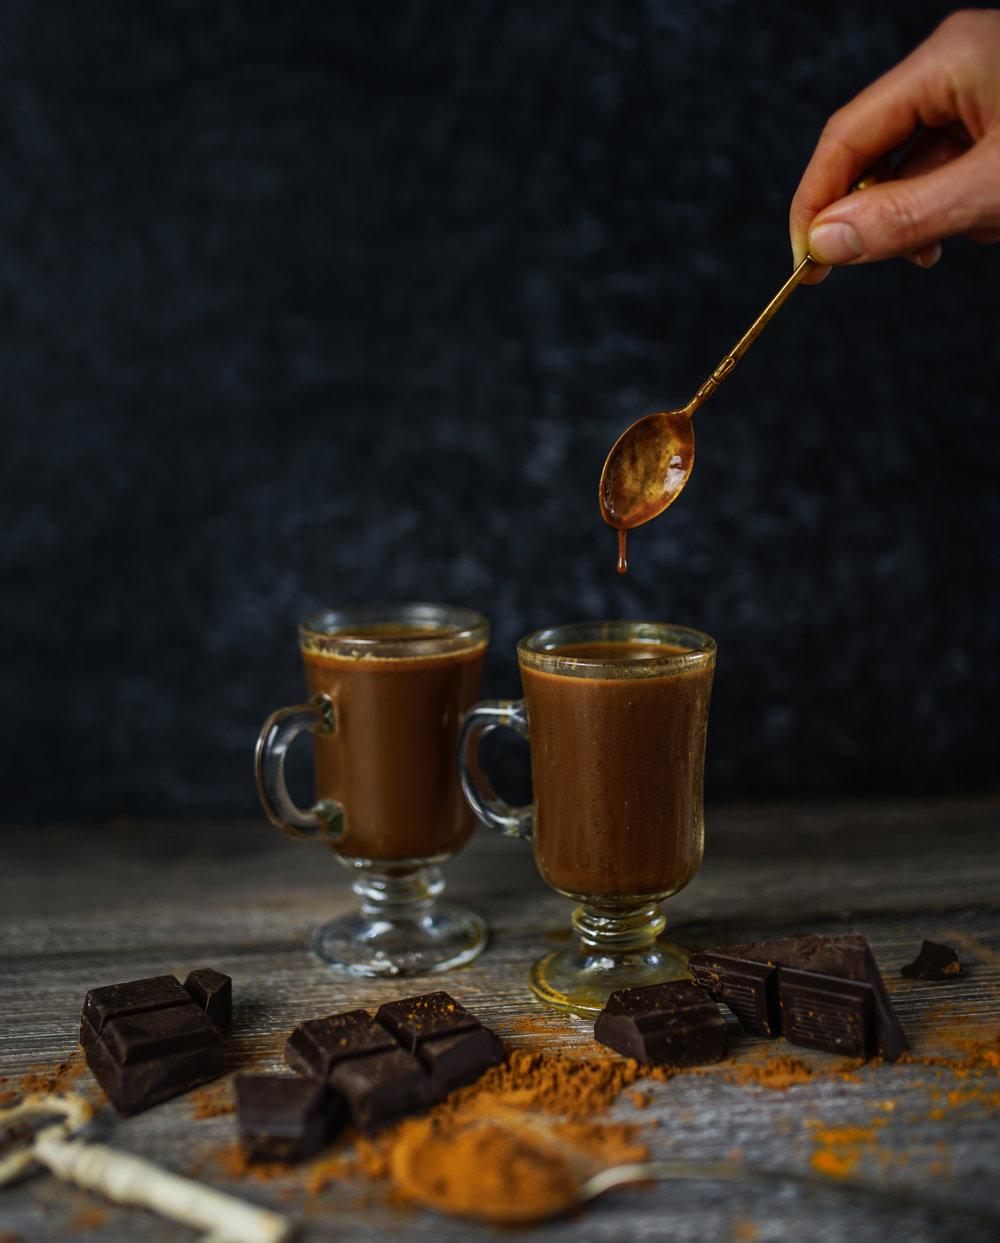 Sips-Flirtatious- Best Ever Hot Cocoa 2.jpg